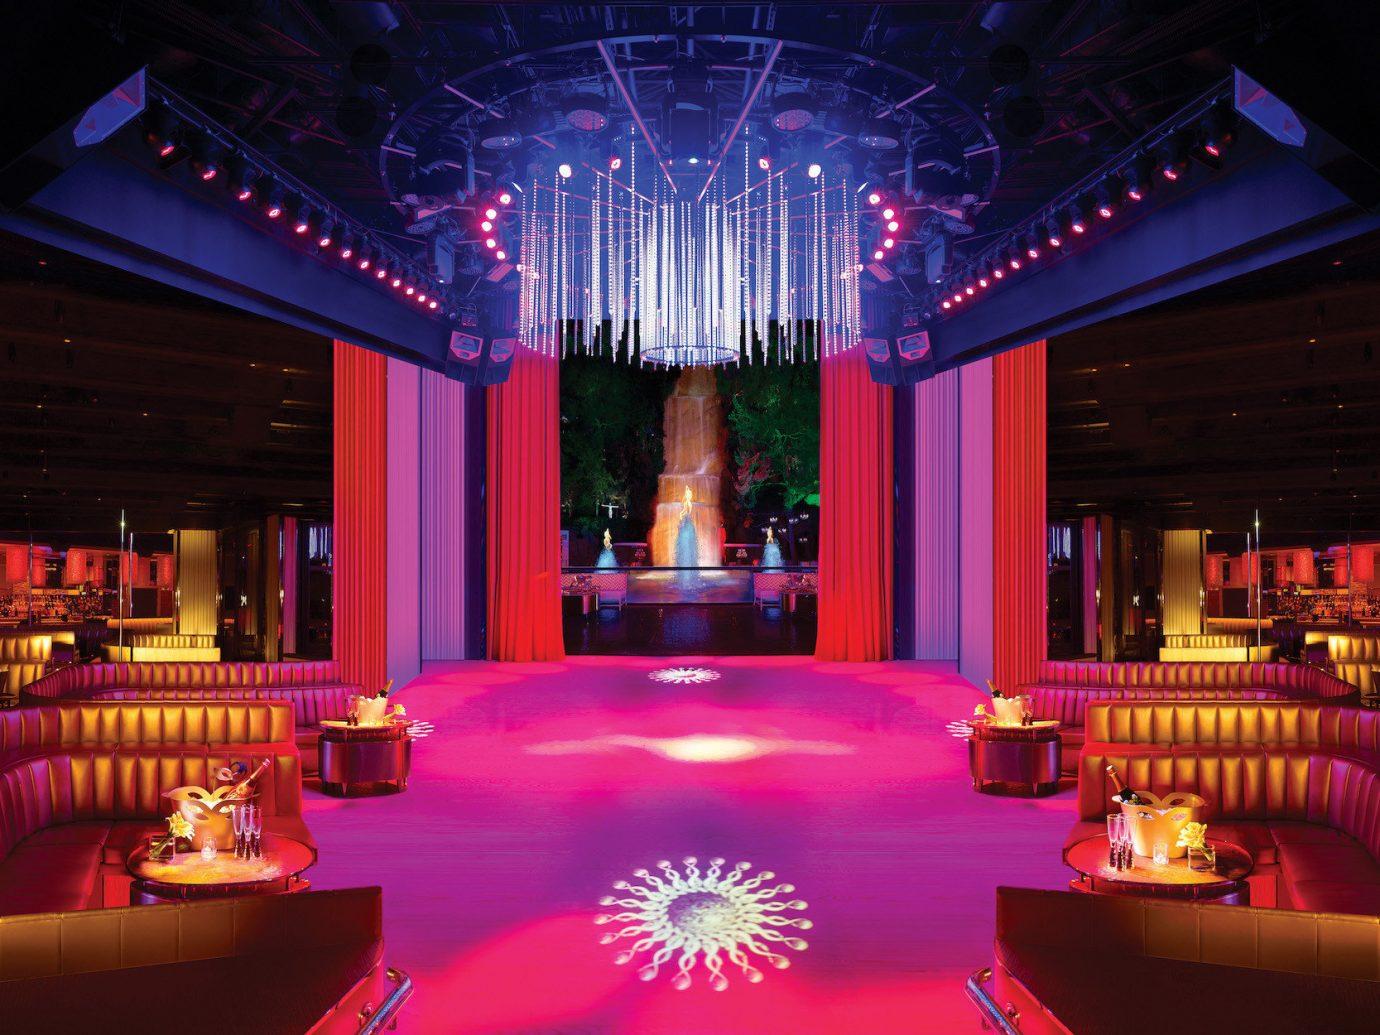 Trip Ideas nightclub function hall stage light